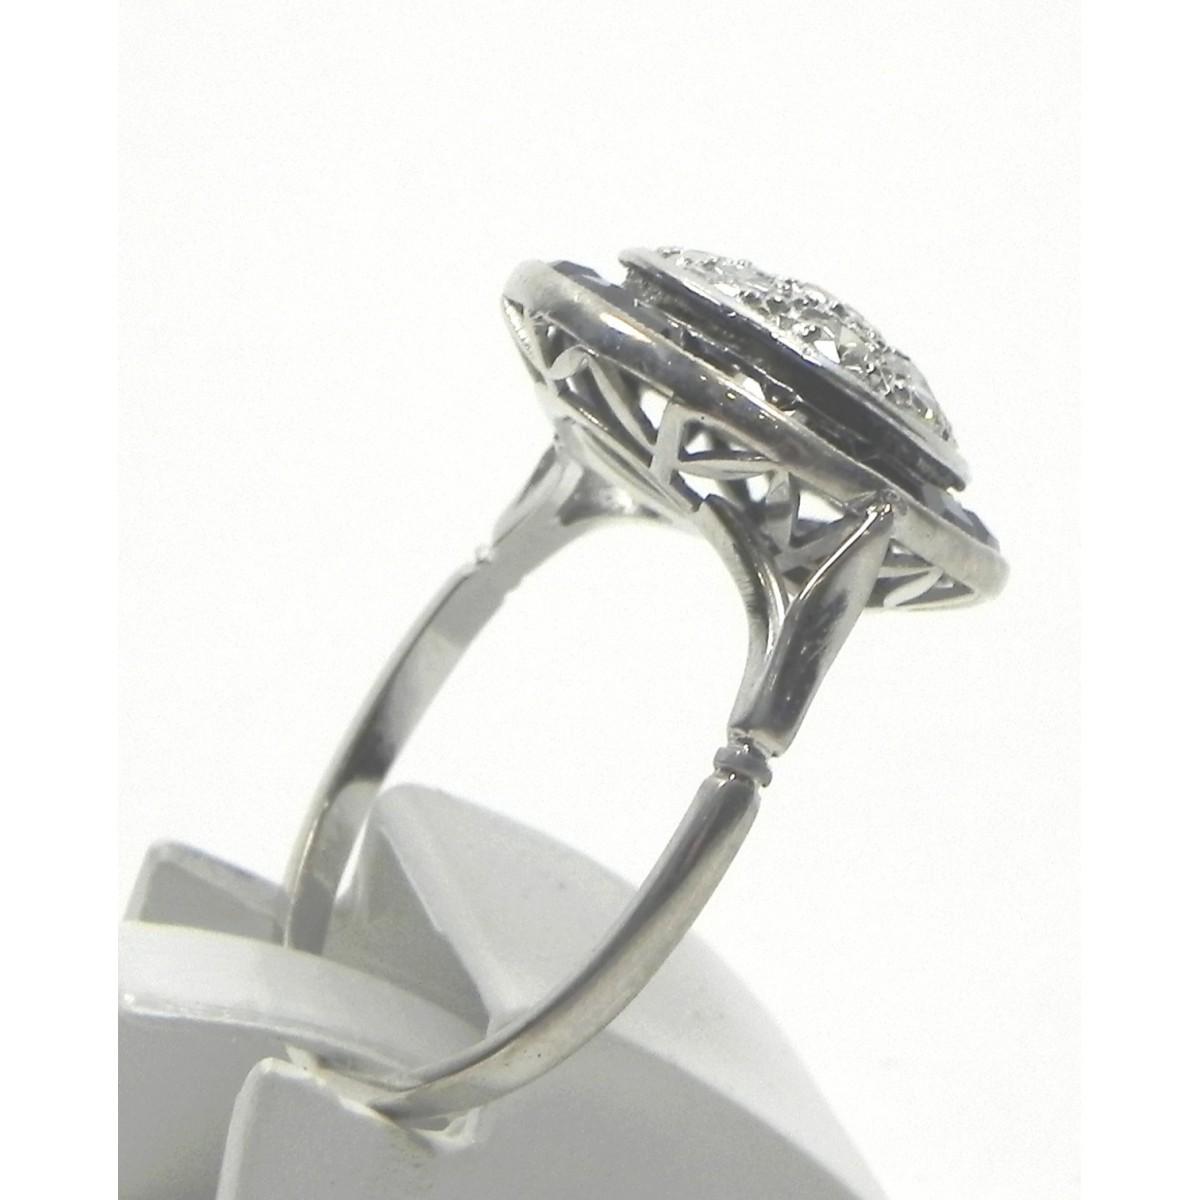 bague art d co or platine saphirs diamants muse or. Black Bedroom Furniture Sets. Home Design Ideas